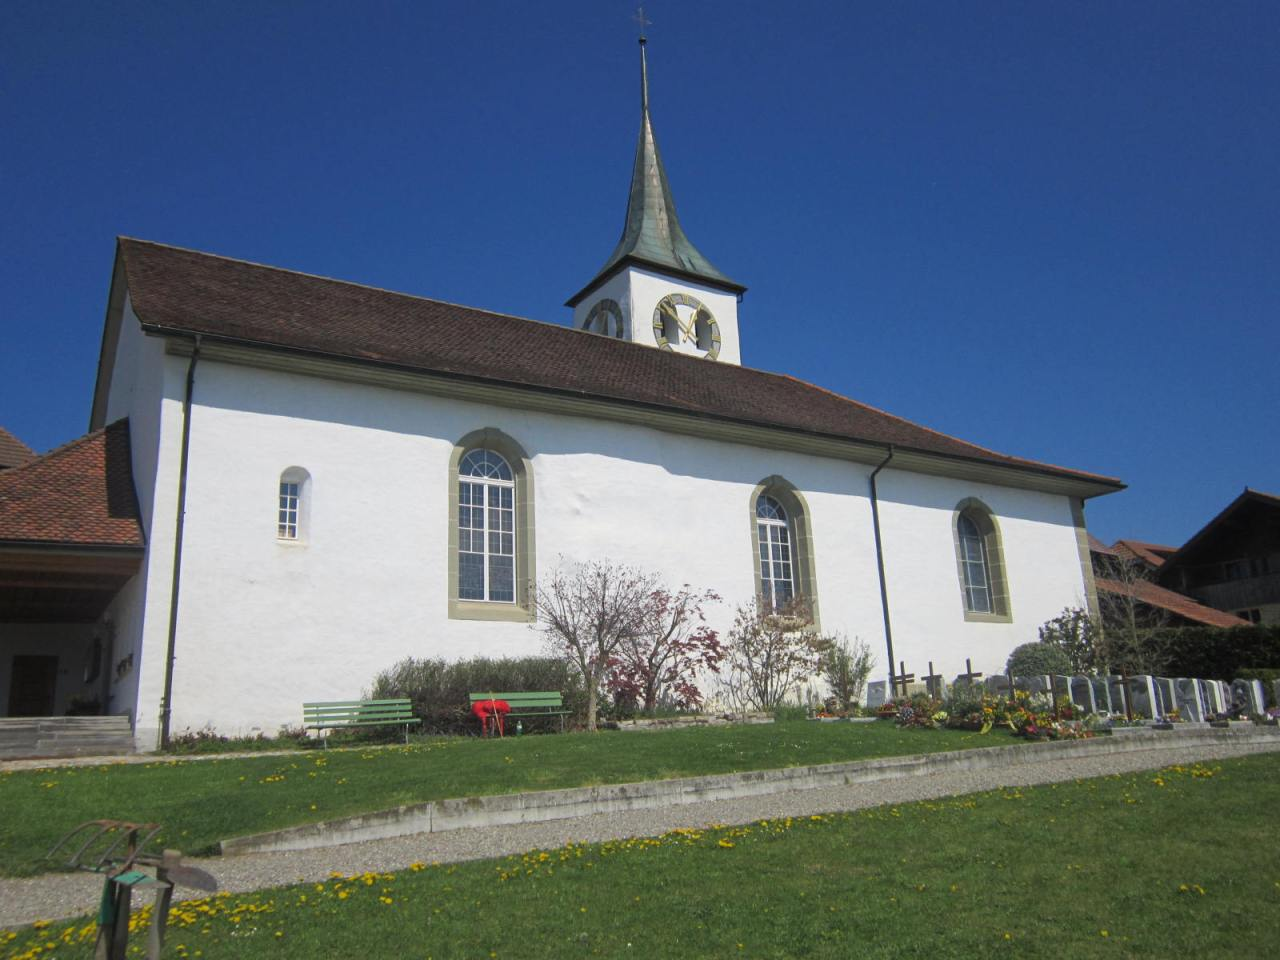 Pilgrim Nev tinkering with the piano keys at Rueggisberg church, on the SwissJakobsweg